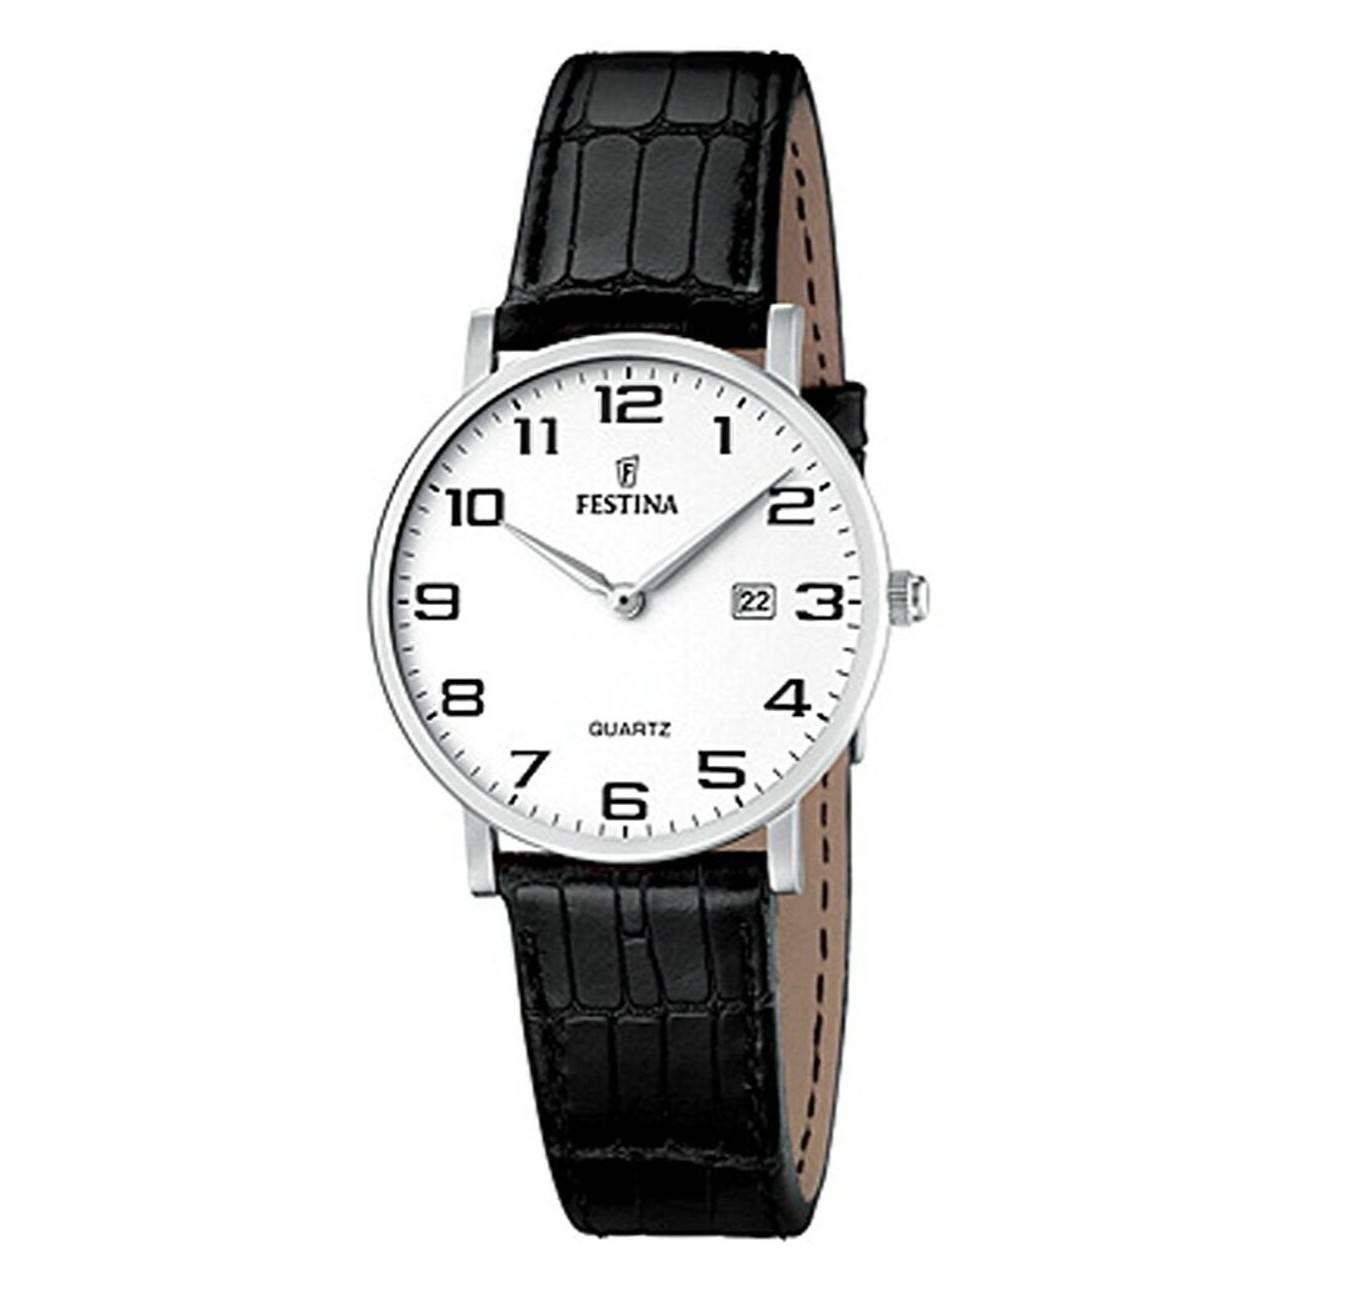 abc0ef11fa09 Reloj festina clásico Joyería Juan Luis Larráyoz Pamplona comprar relojes  festina